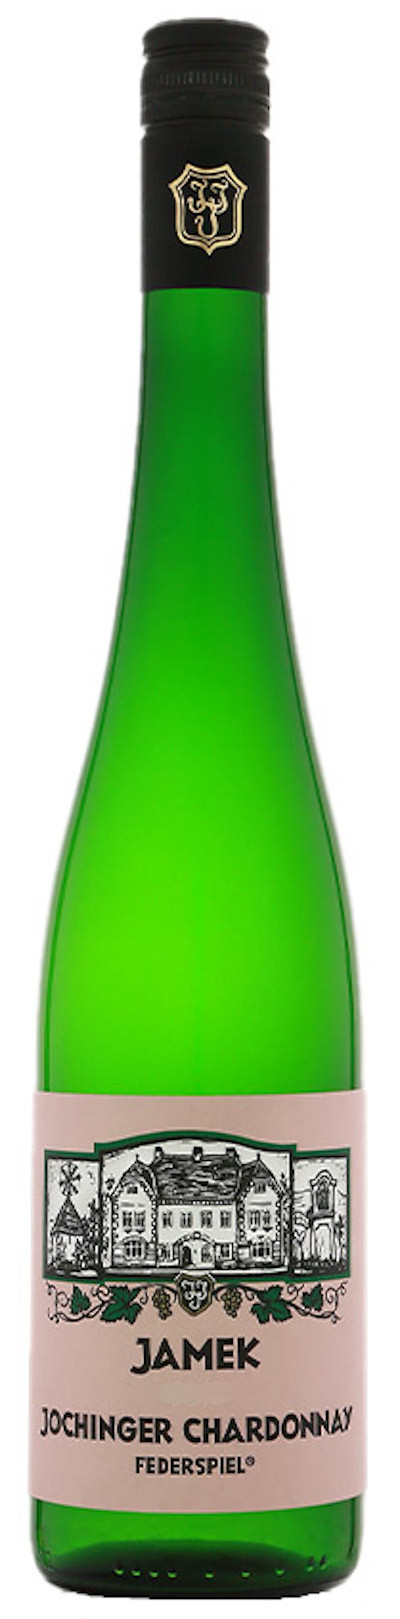 Jamek - Chardonnay Federspiel Jochinger